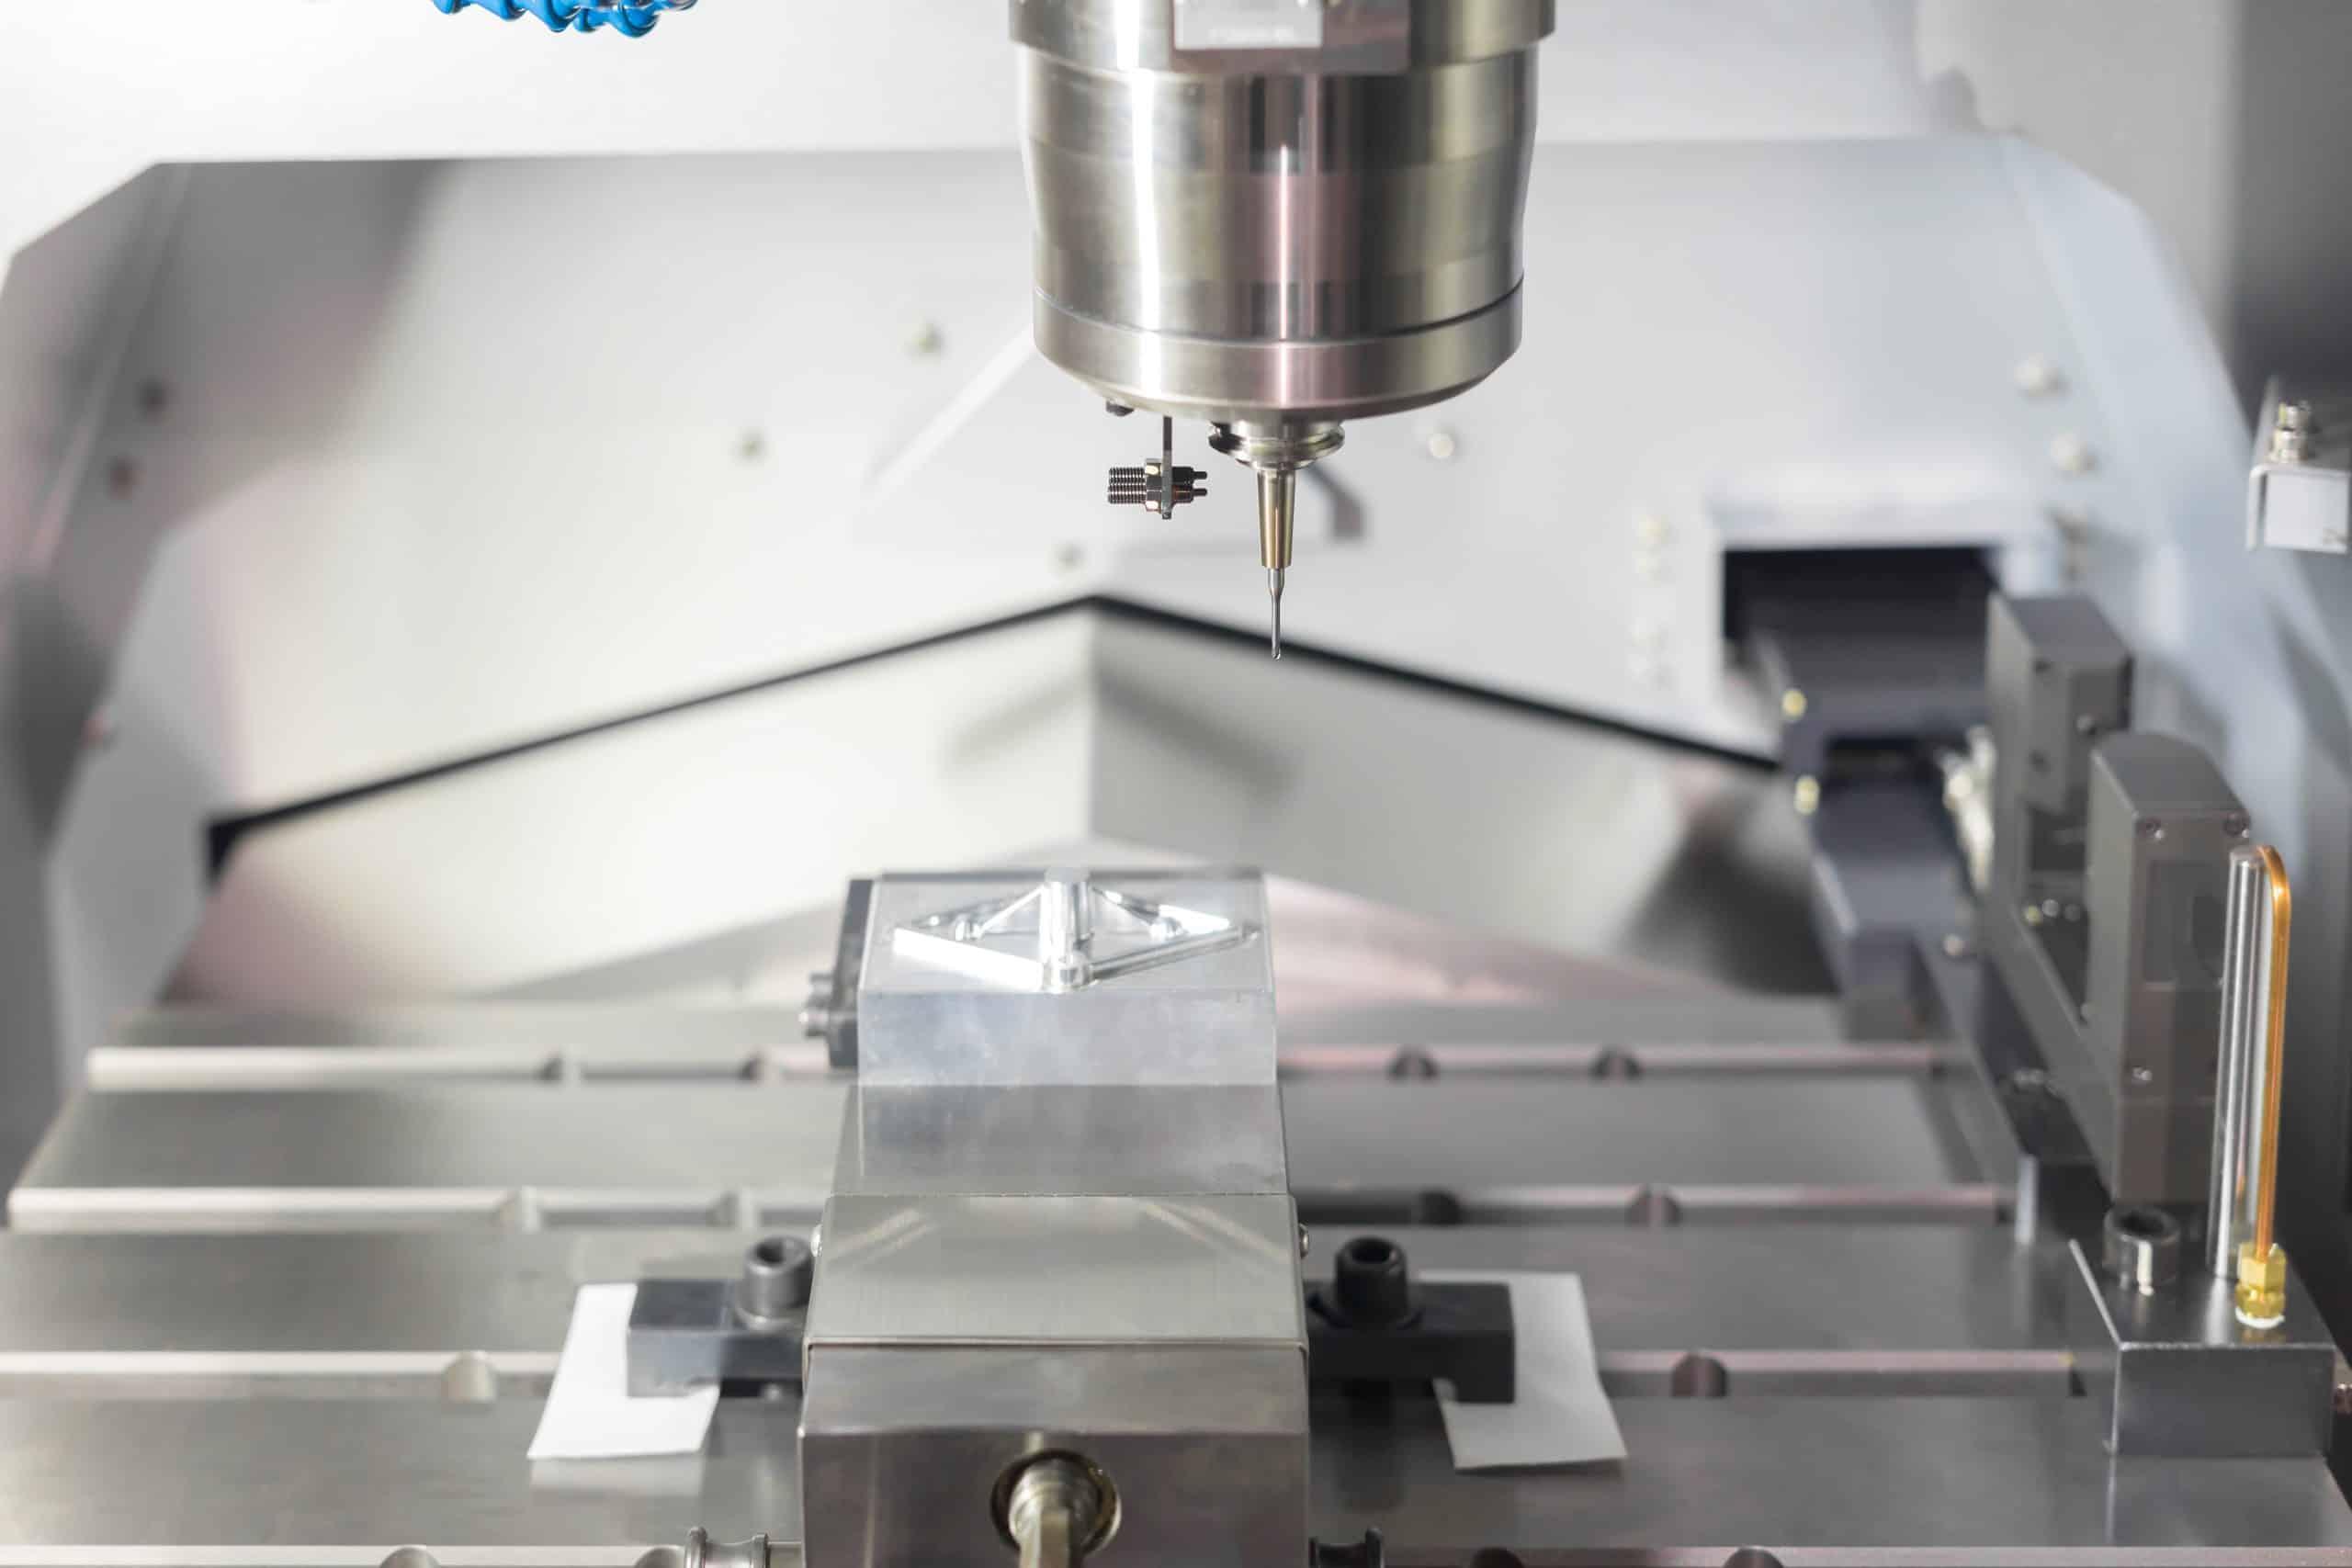 precision part with a cnc milling machine